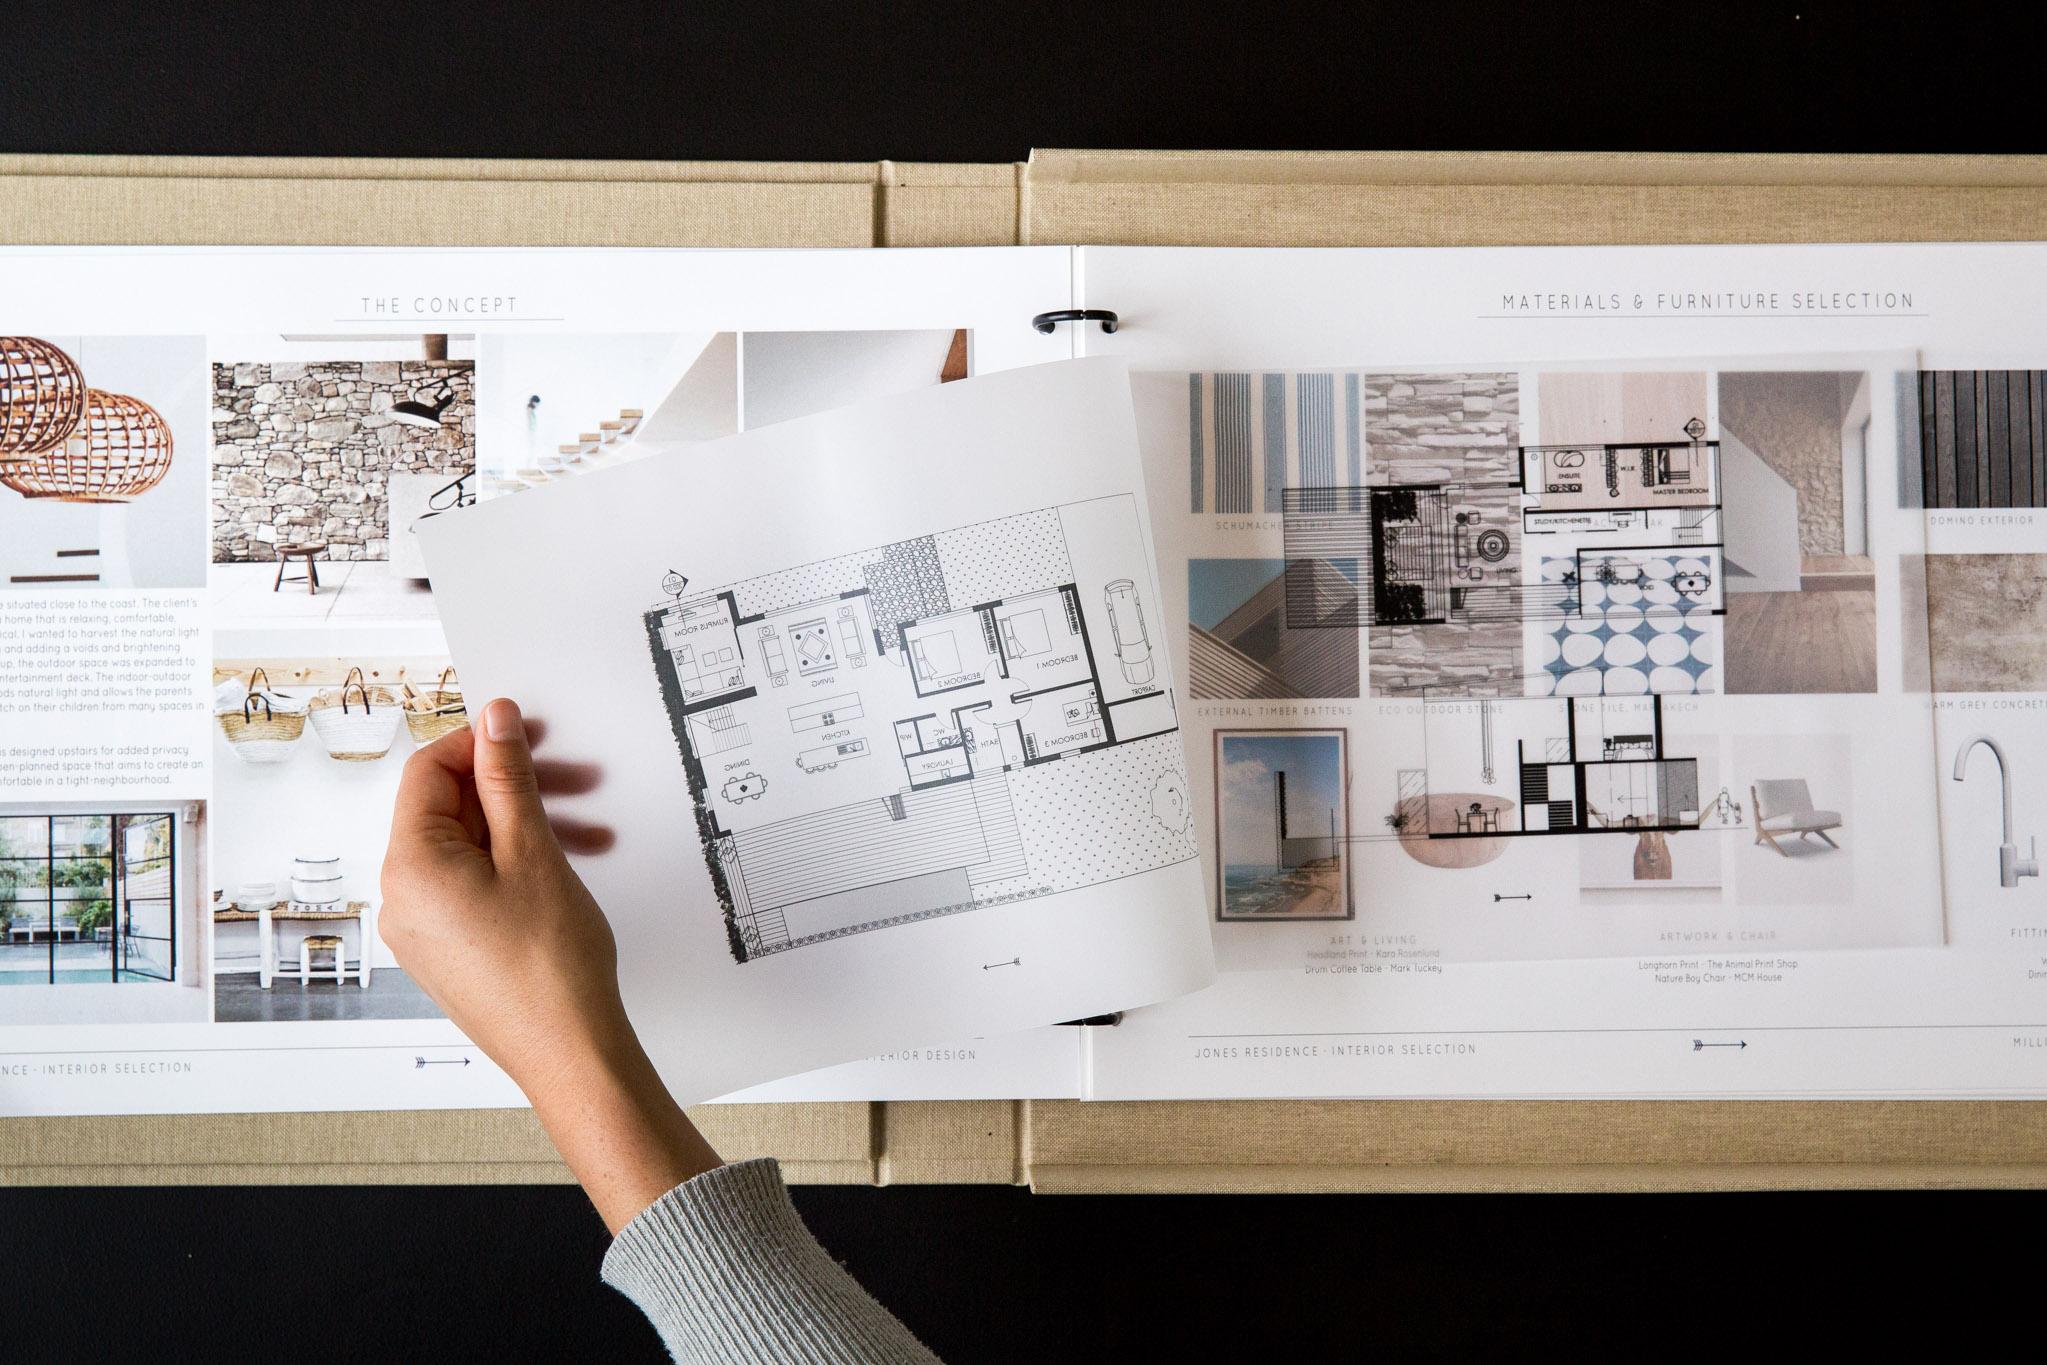 Sydney Design School - Interior Design Online